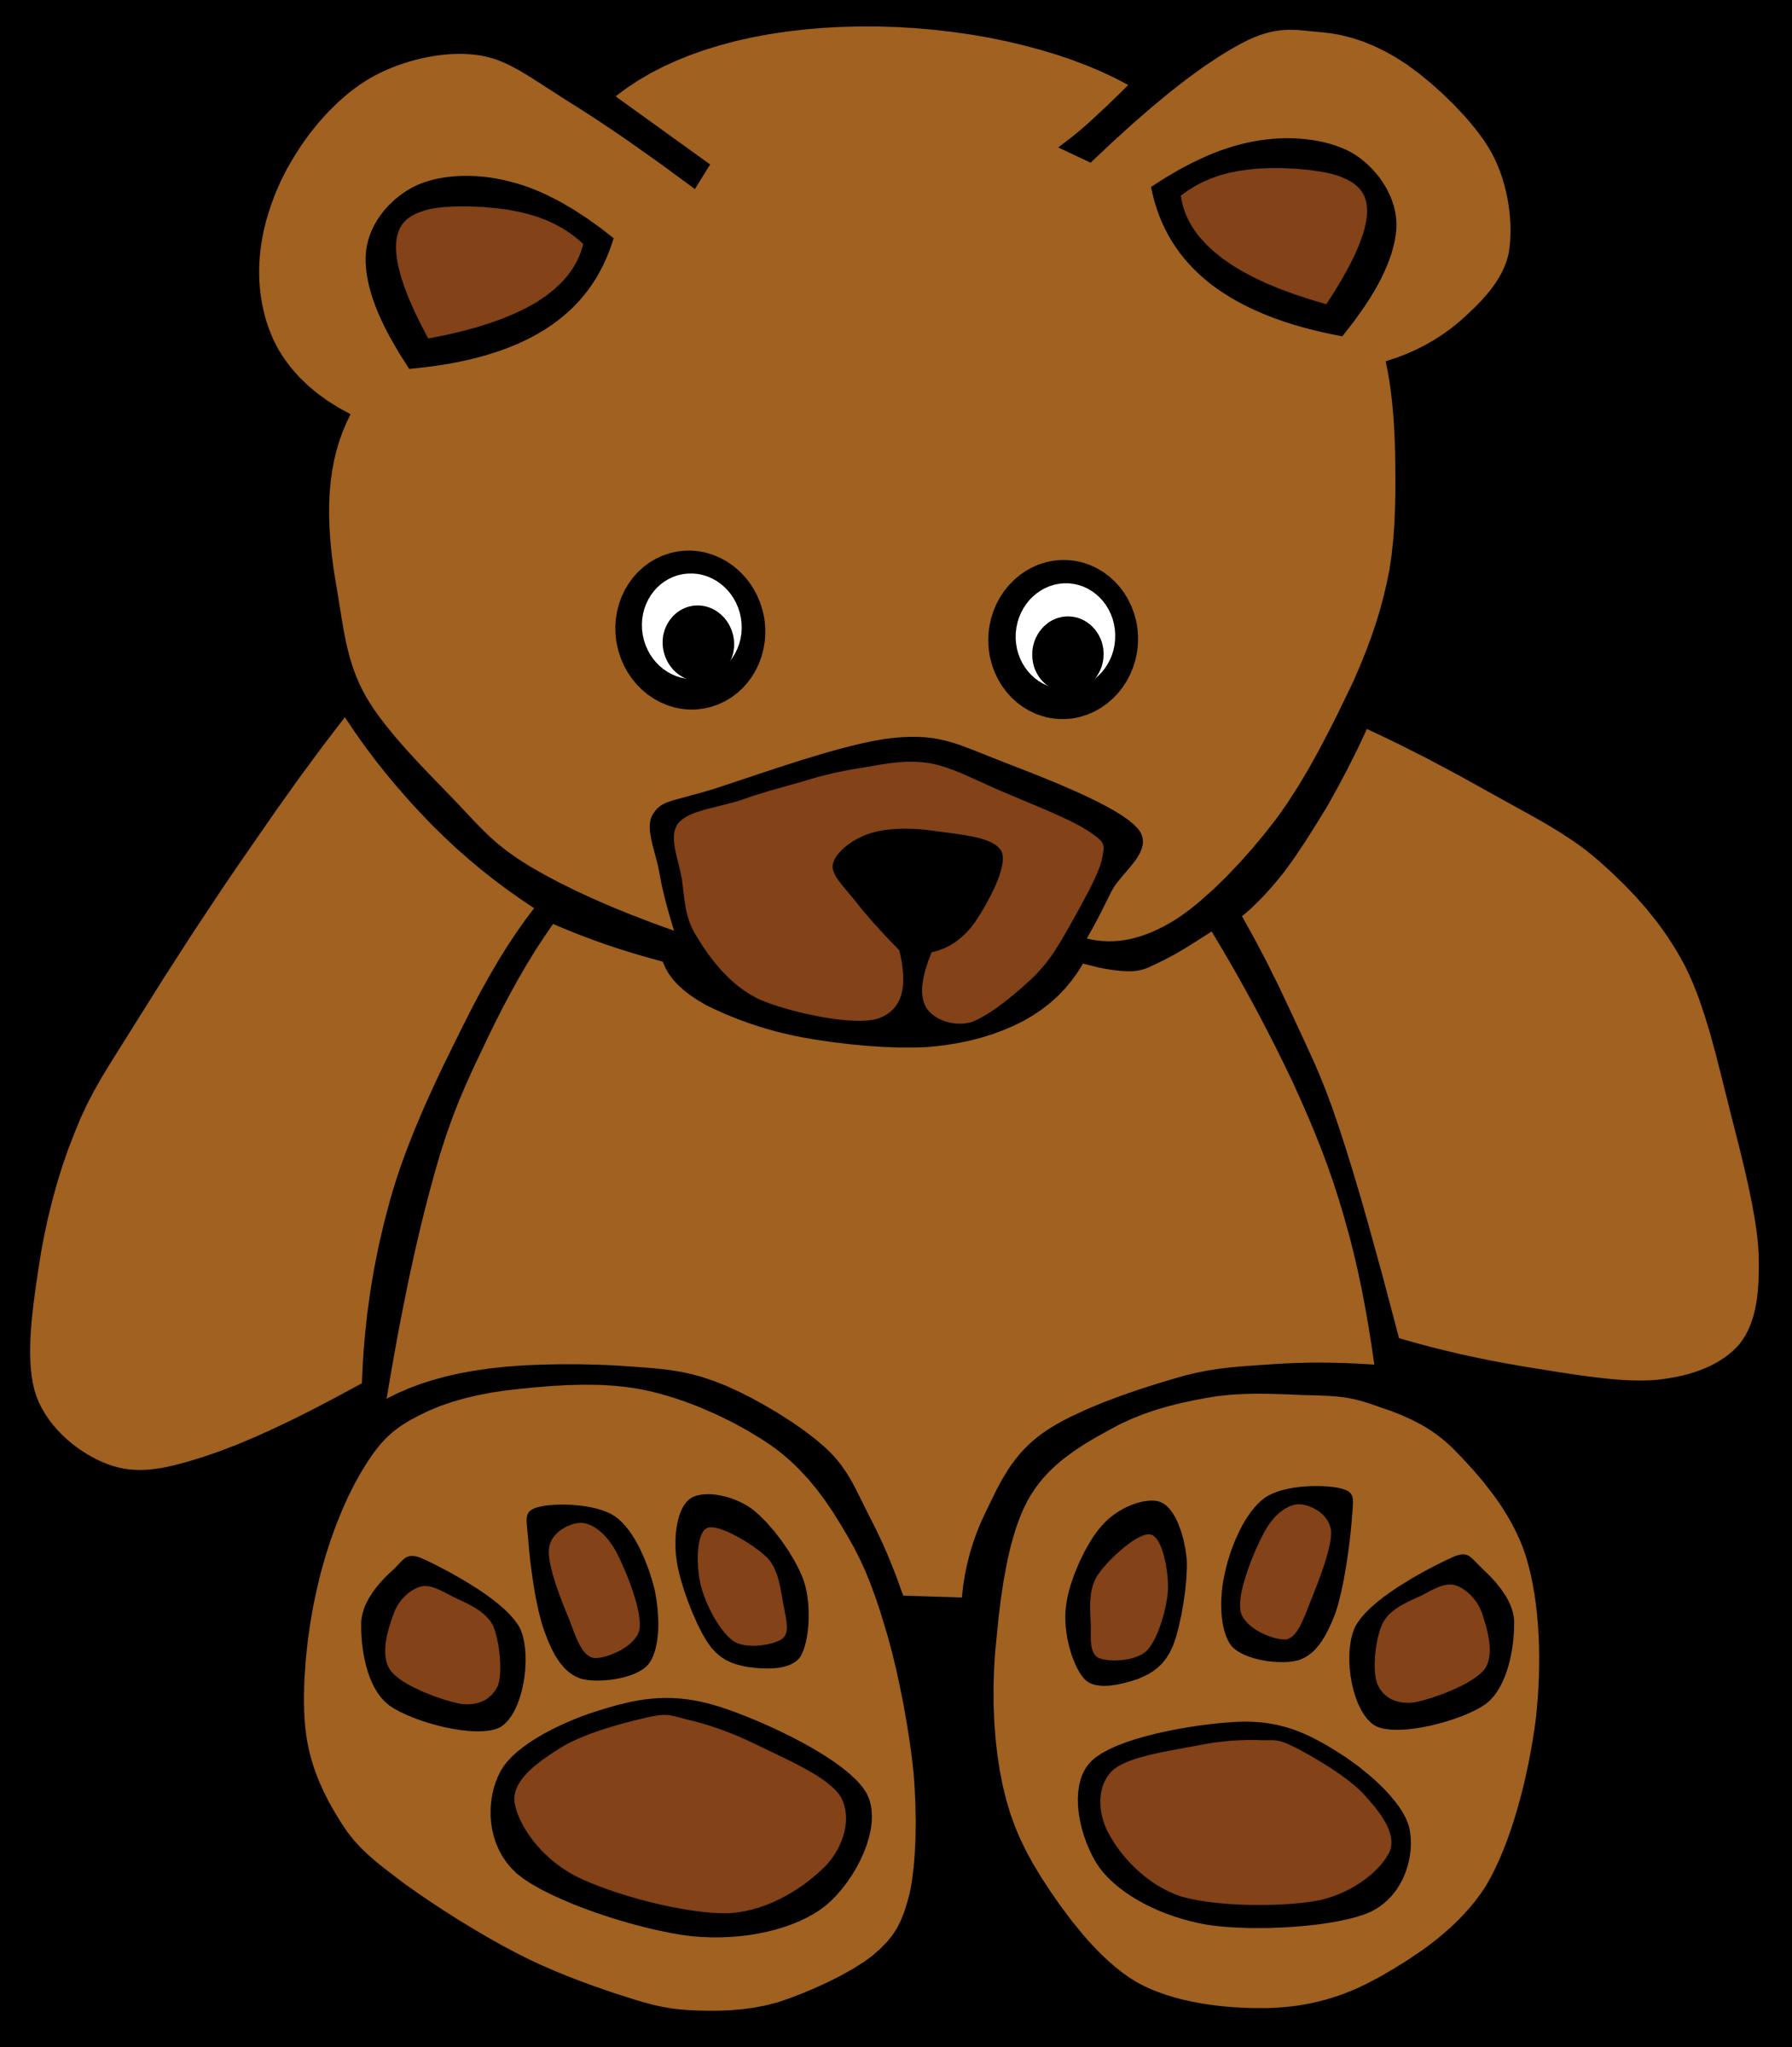 Nurse bear clipart png stock Nurse clipart bear, Nurse bear Transparent FREE for download ... png stock